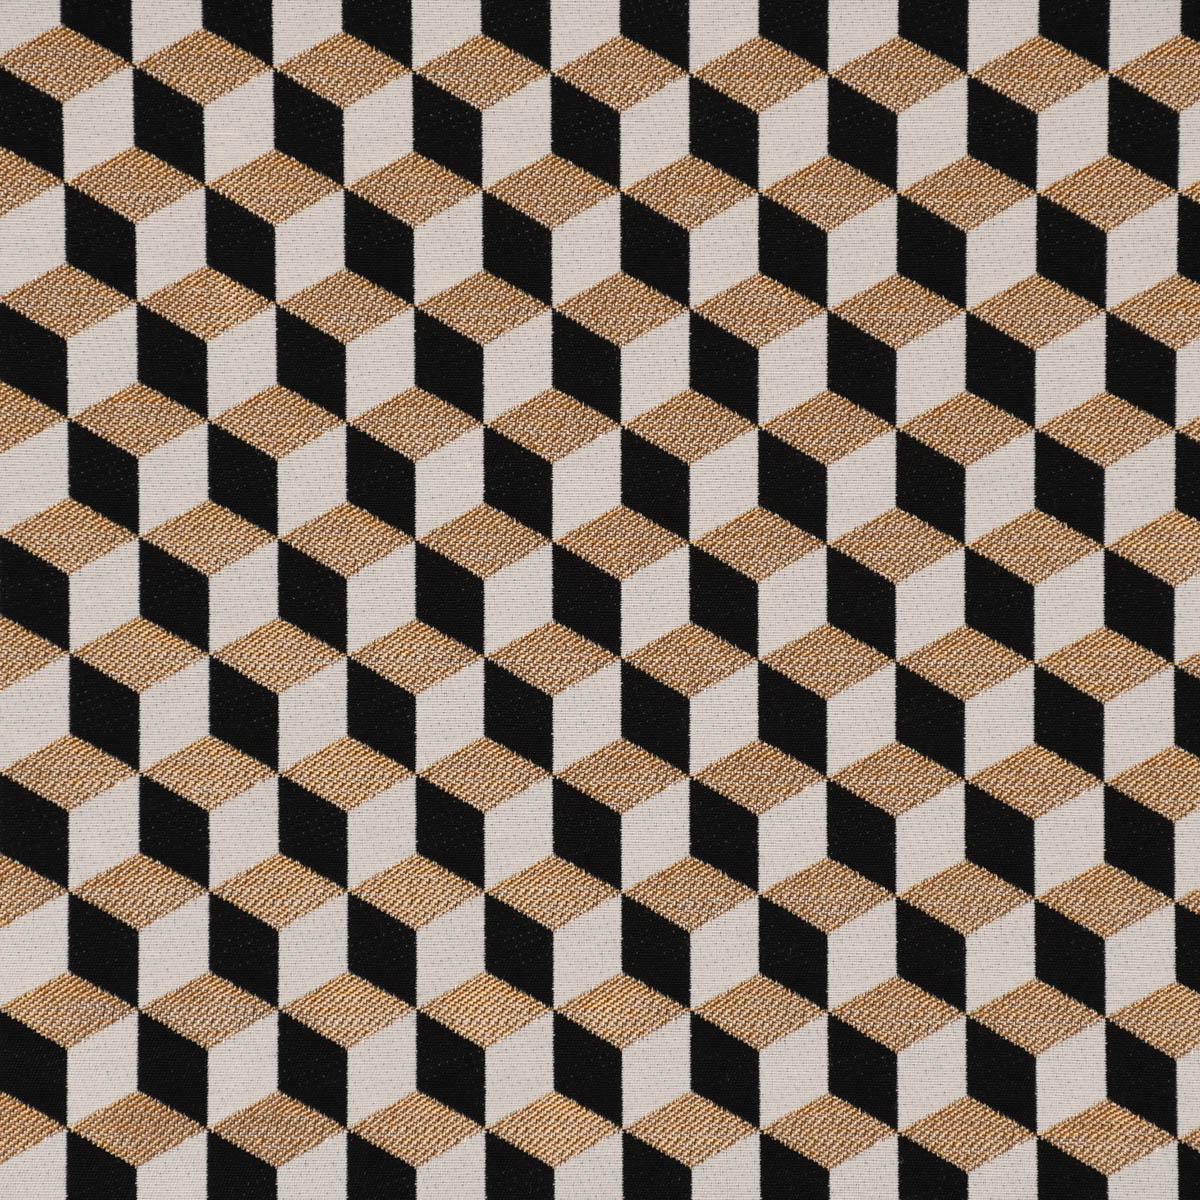 Dekostoff Jacquard Metallic Cube Geometric Luxury 3D Würfel schwarz gold ecru 1,4m Breite